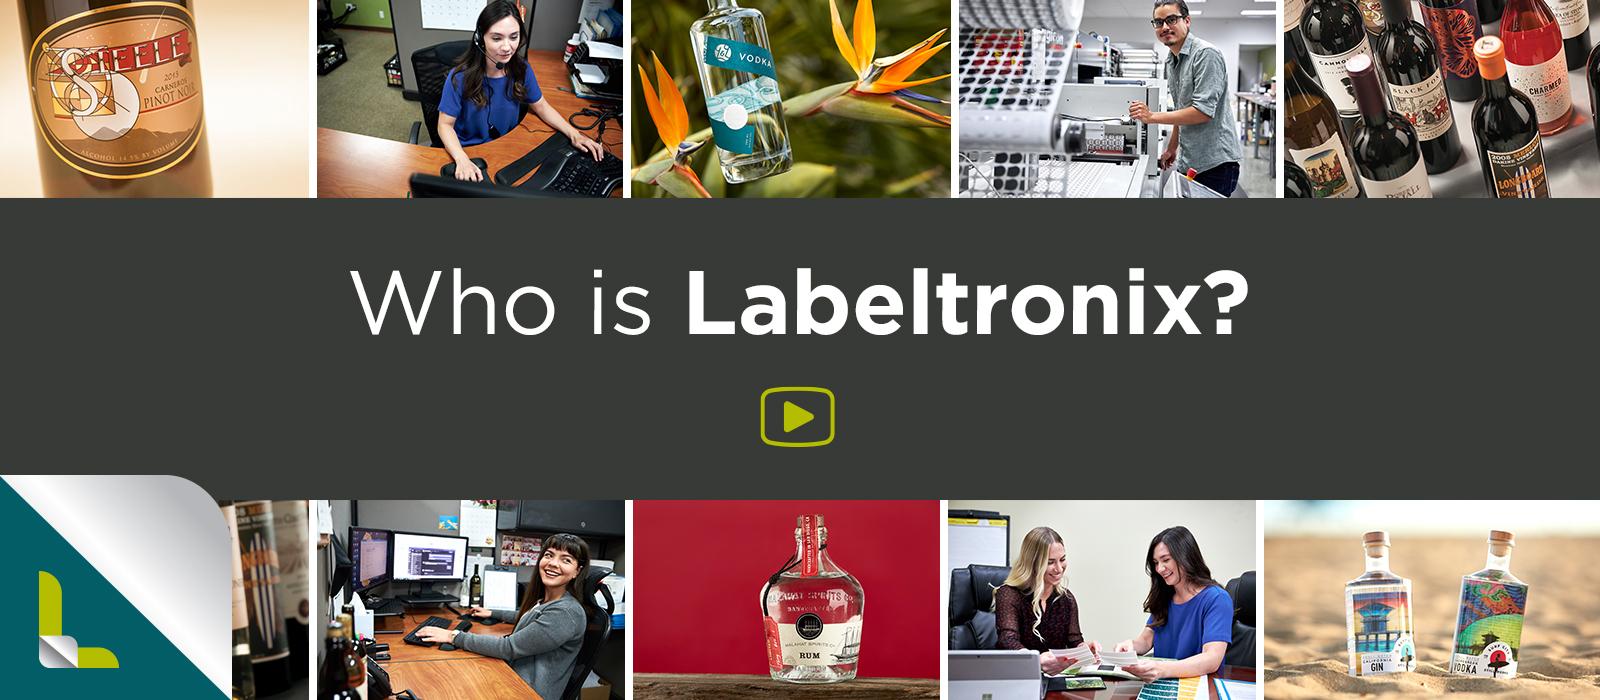 Image: Labeltronix